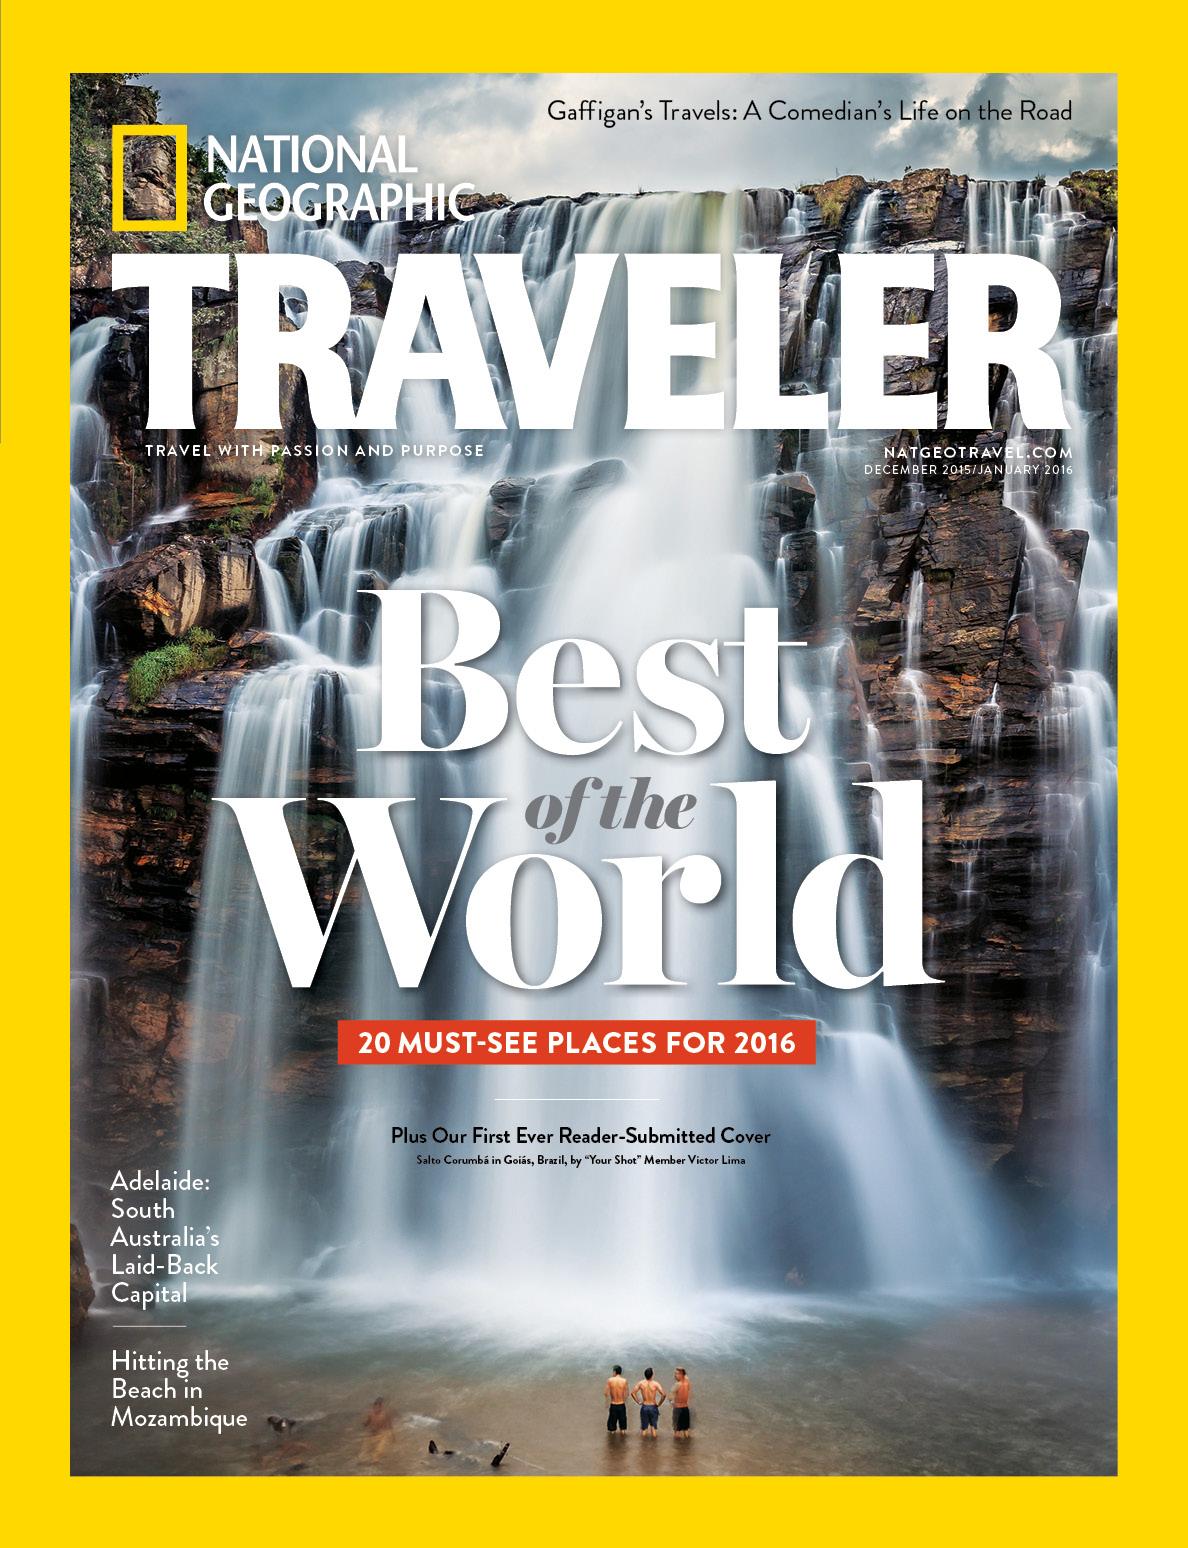 Get More Travel Inspiration